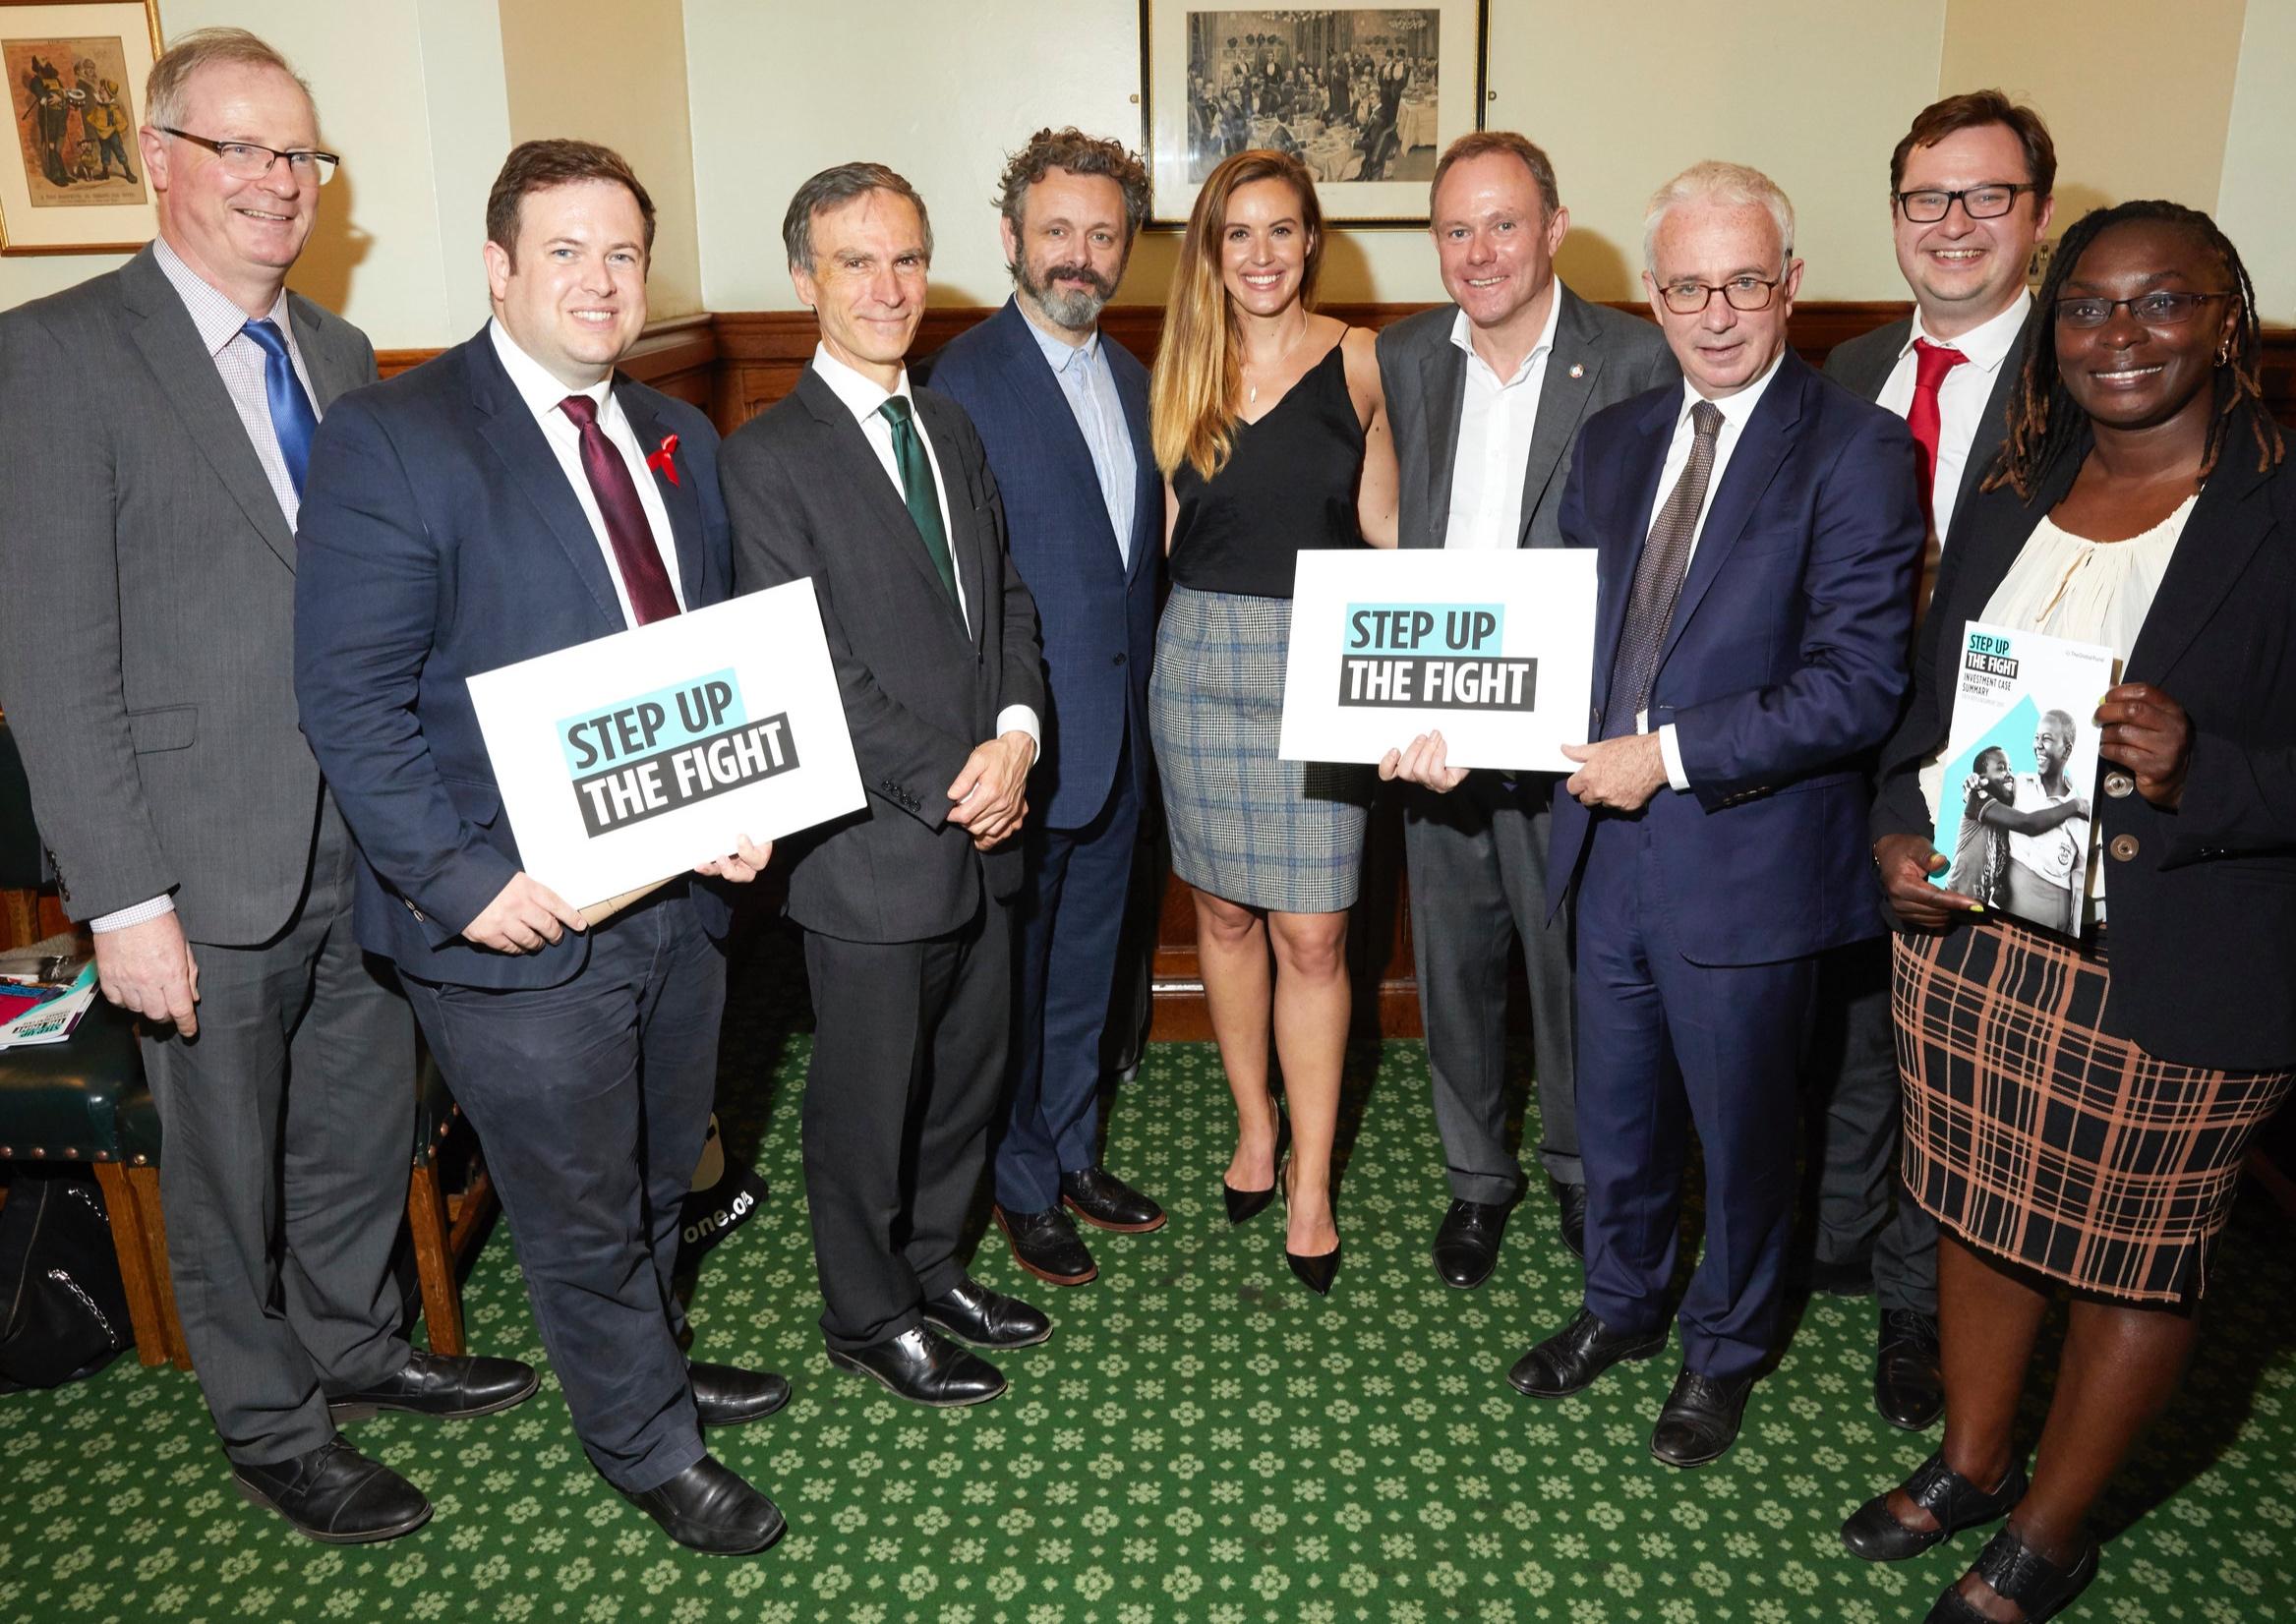 Left to right: Jeremy Lefroy MP, Stephen Doughty MP, Minister for International Development Andrew Murrison MP, Michael Sheen, Charlie Webster, Rt Hon Nick Herbert MP, Peter Sands, Dan Norris MP, Maurine Murenga